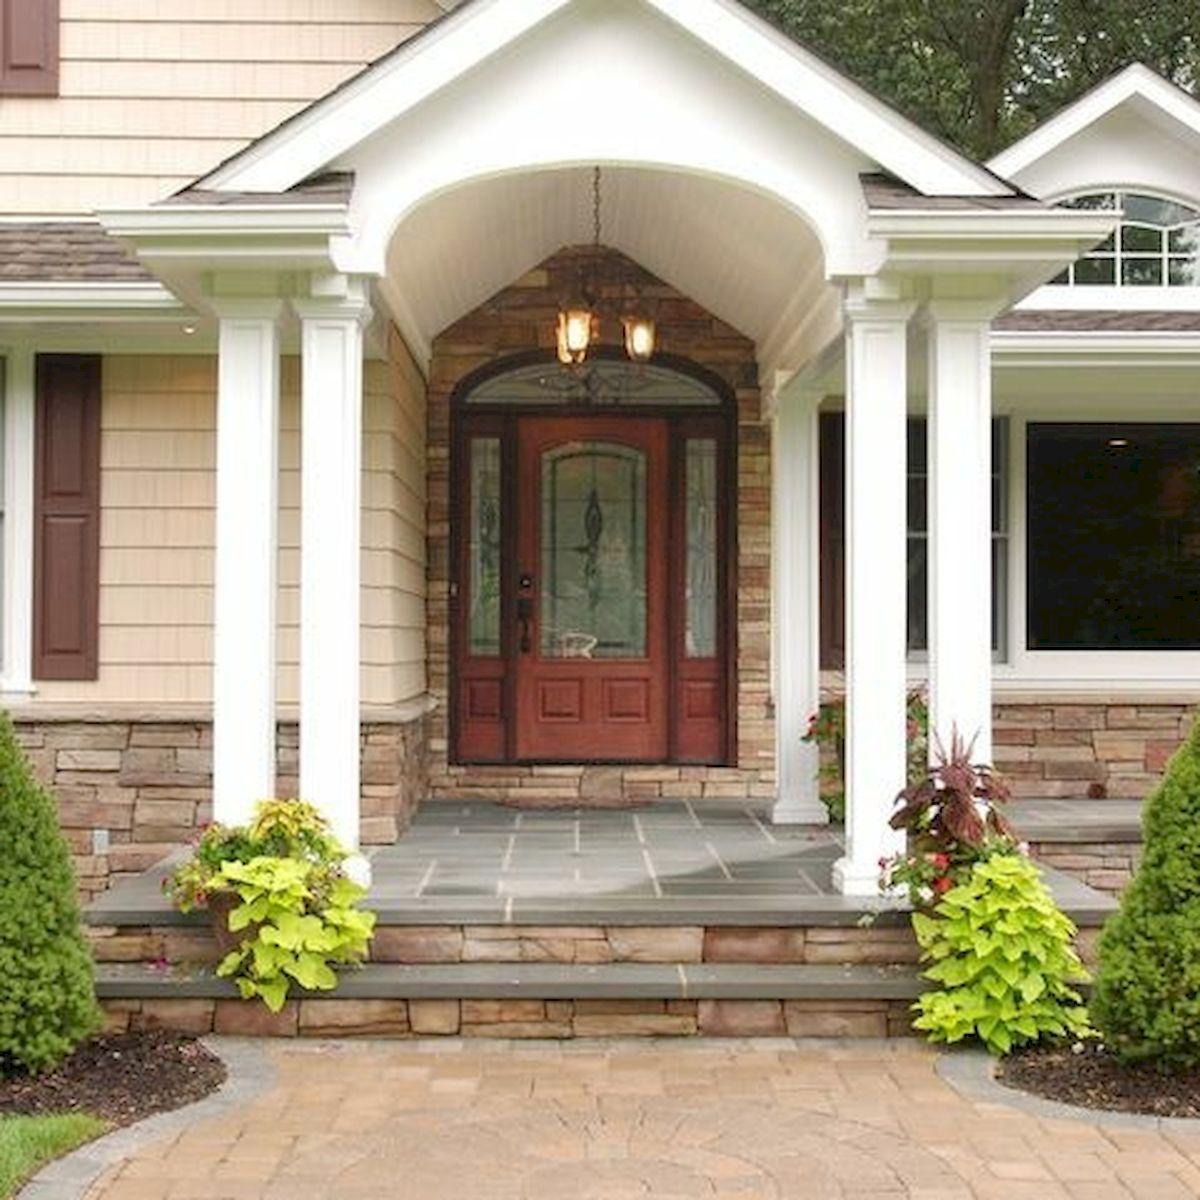 70 Stunning Exterior House Design Ideas (50)